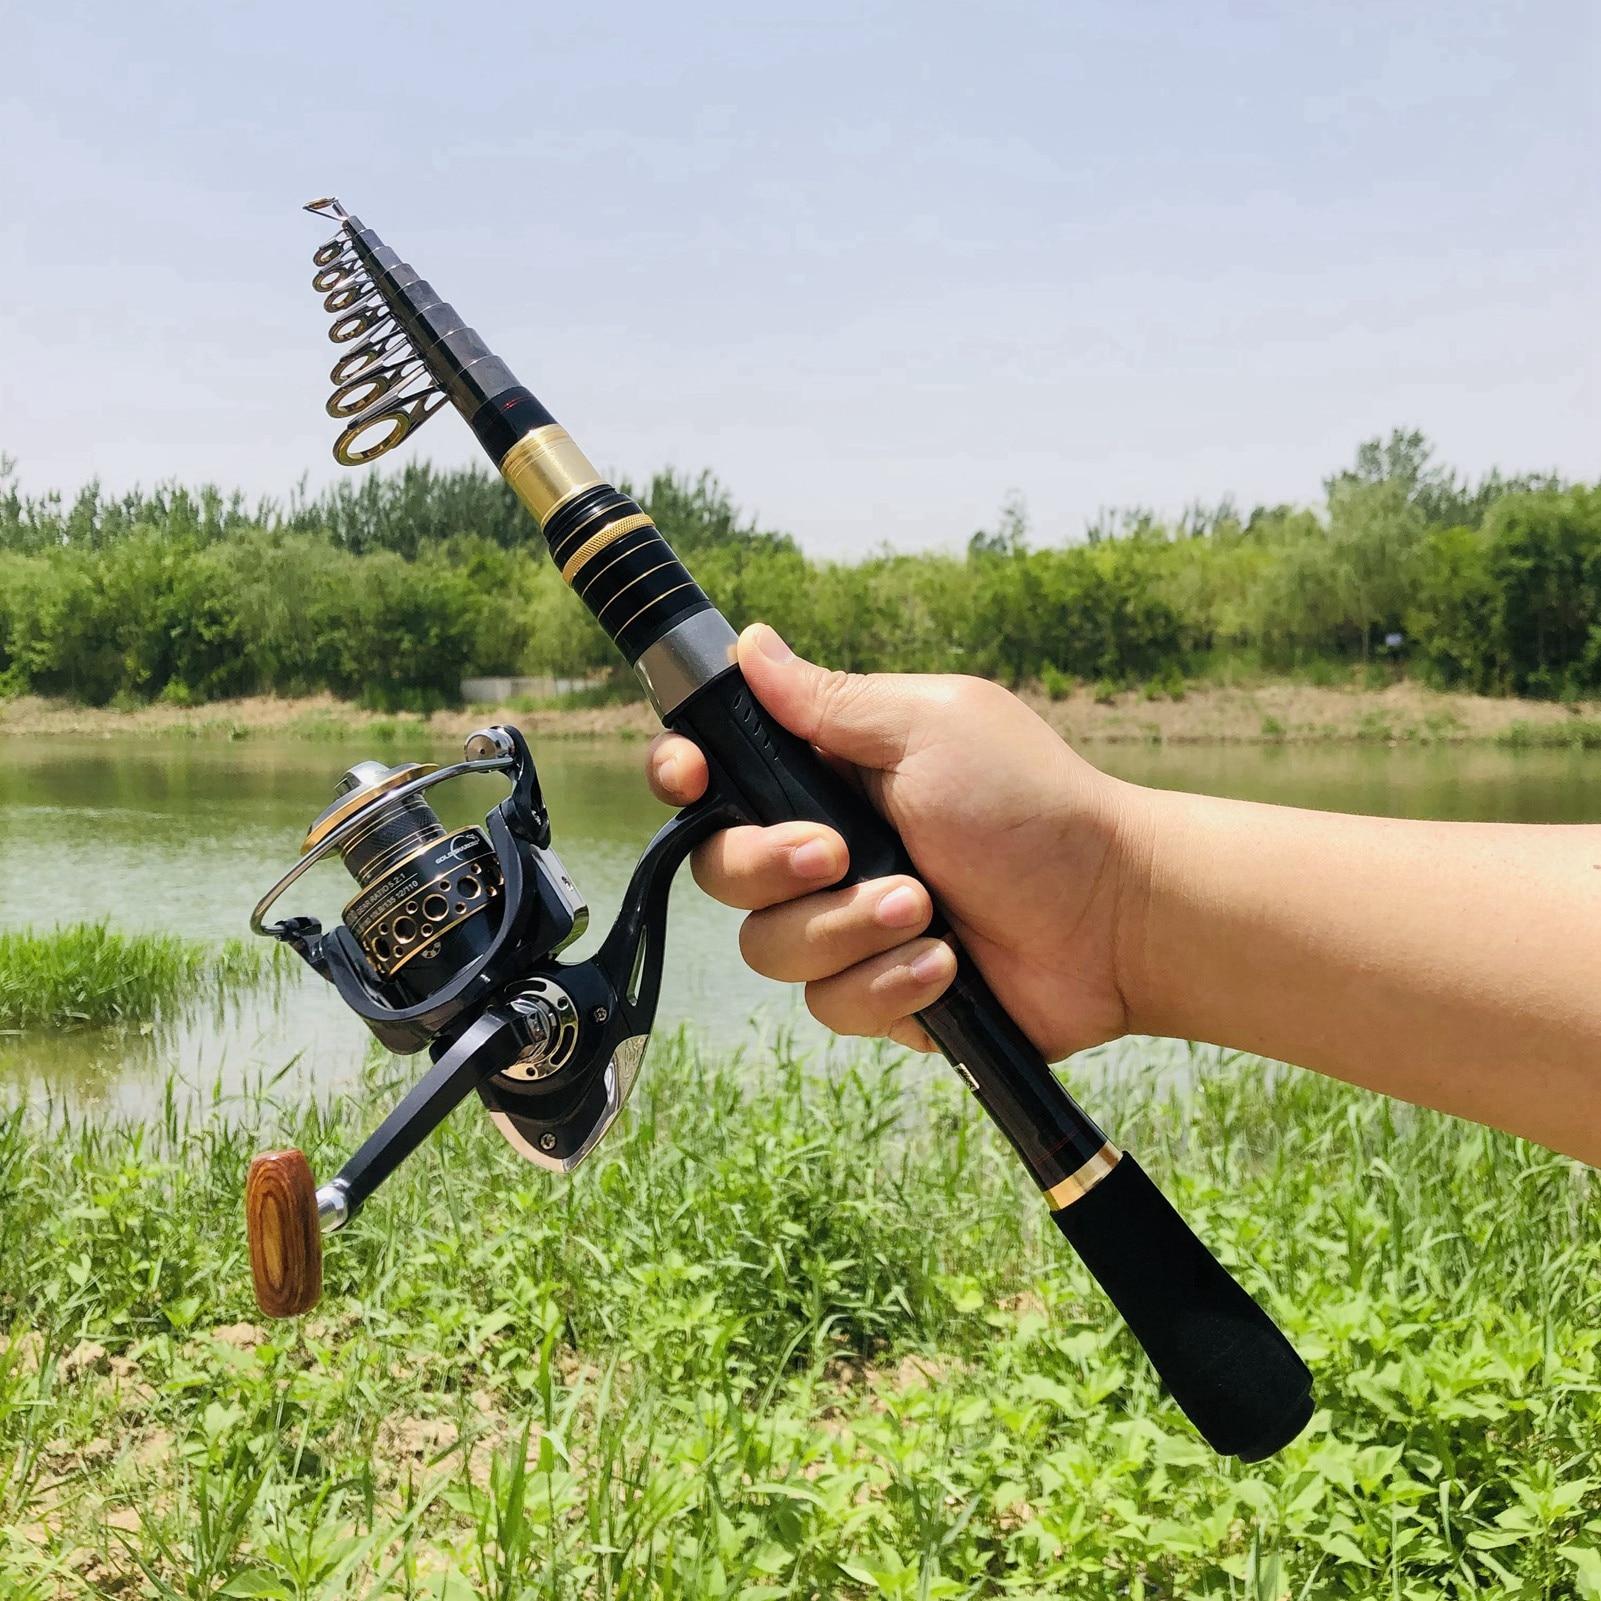 1.8m2.1m2.4m2.7m3.0m3.3m Carbon Portable Fishing Rod Spinning Rod and Reel set Rod Reel Combos carp Fast long shot sea fishing